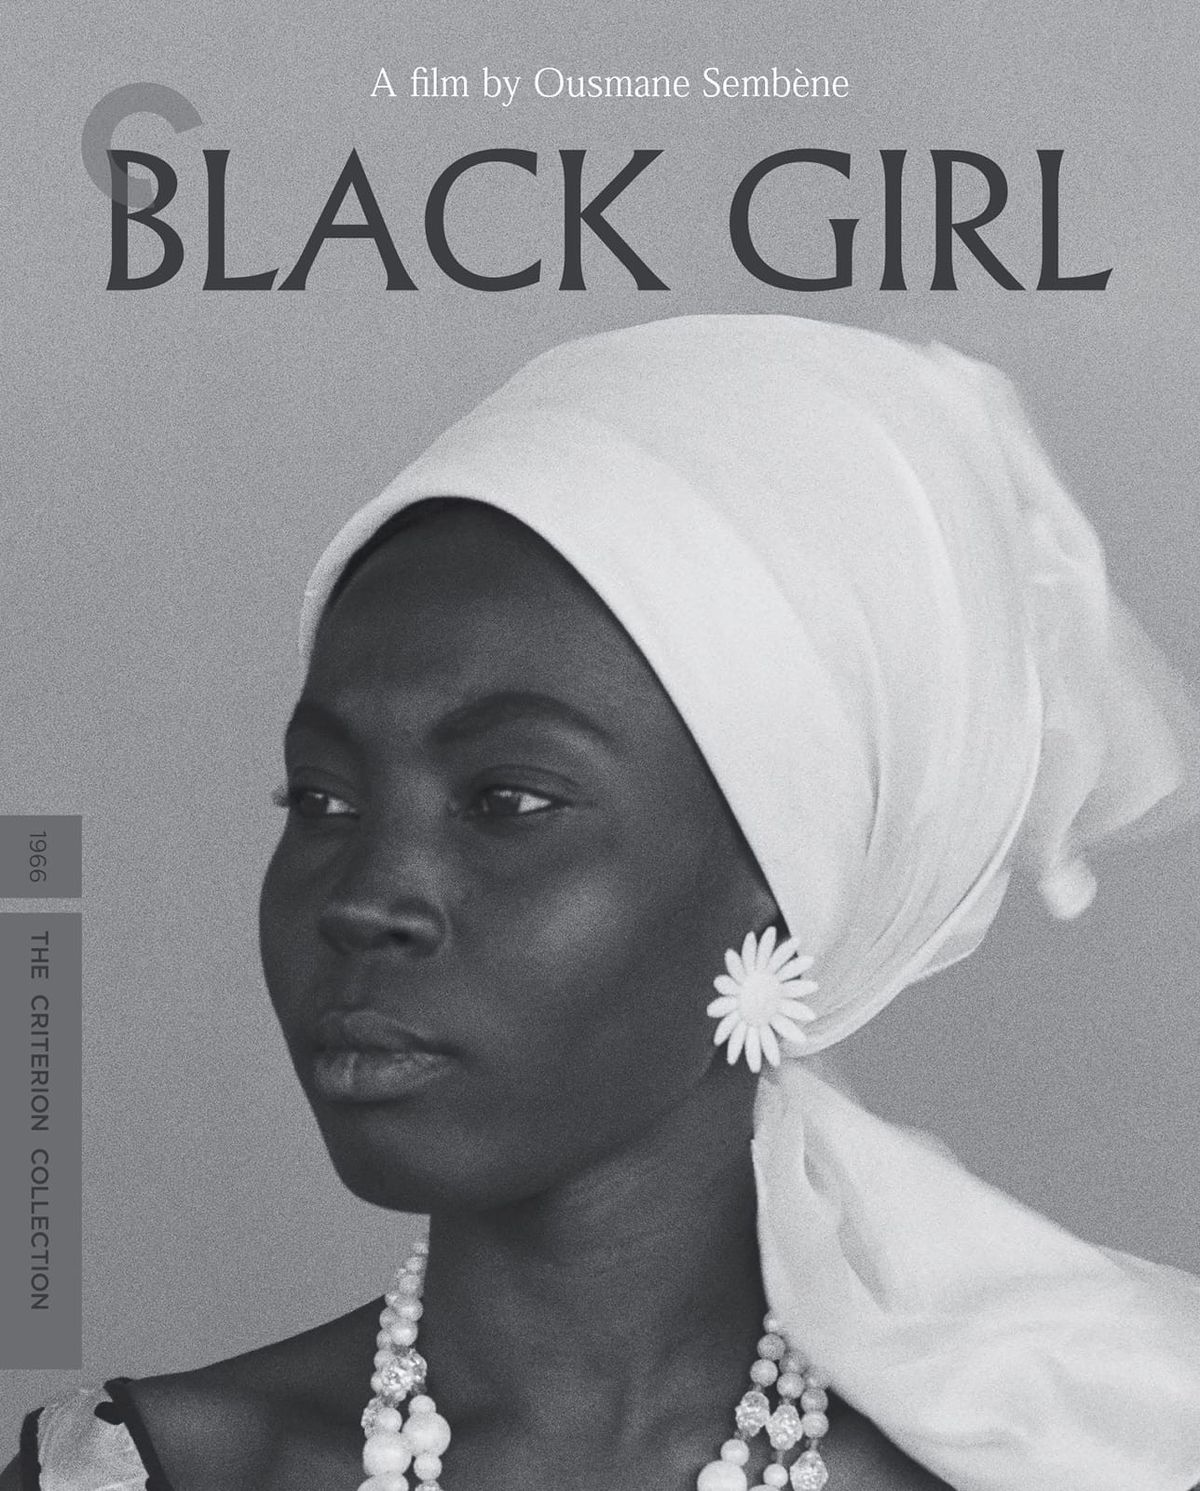 The DVD box cover for the film Black Girl by Ousmane Sembene